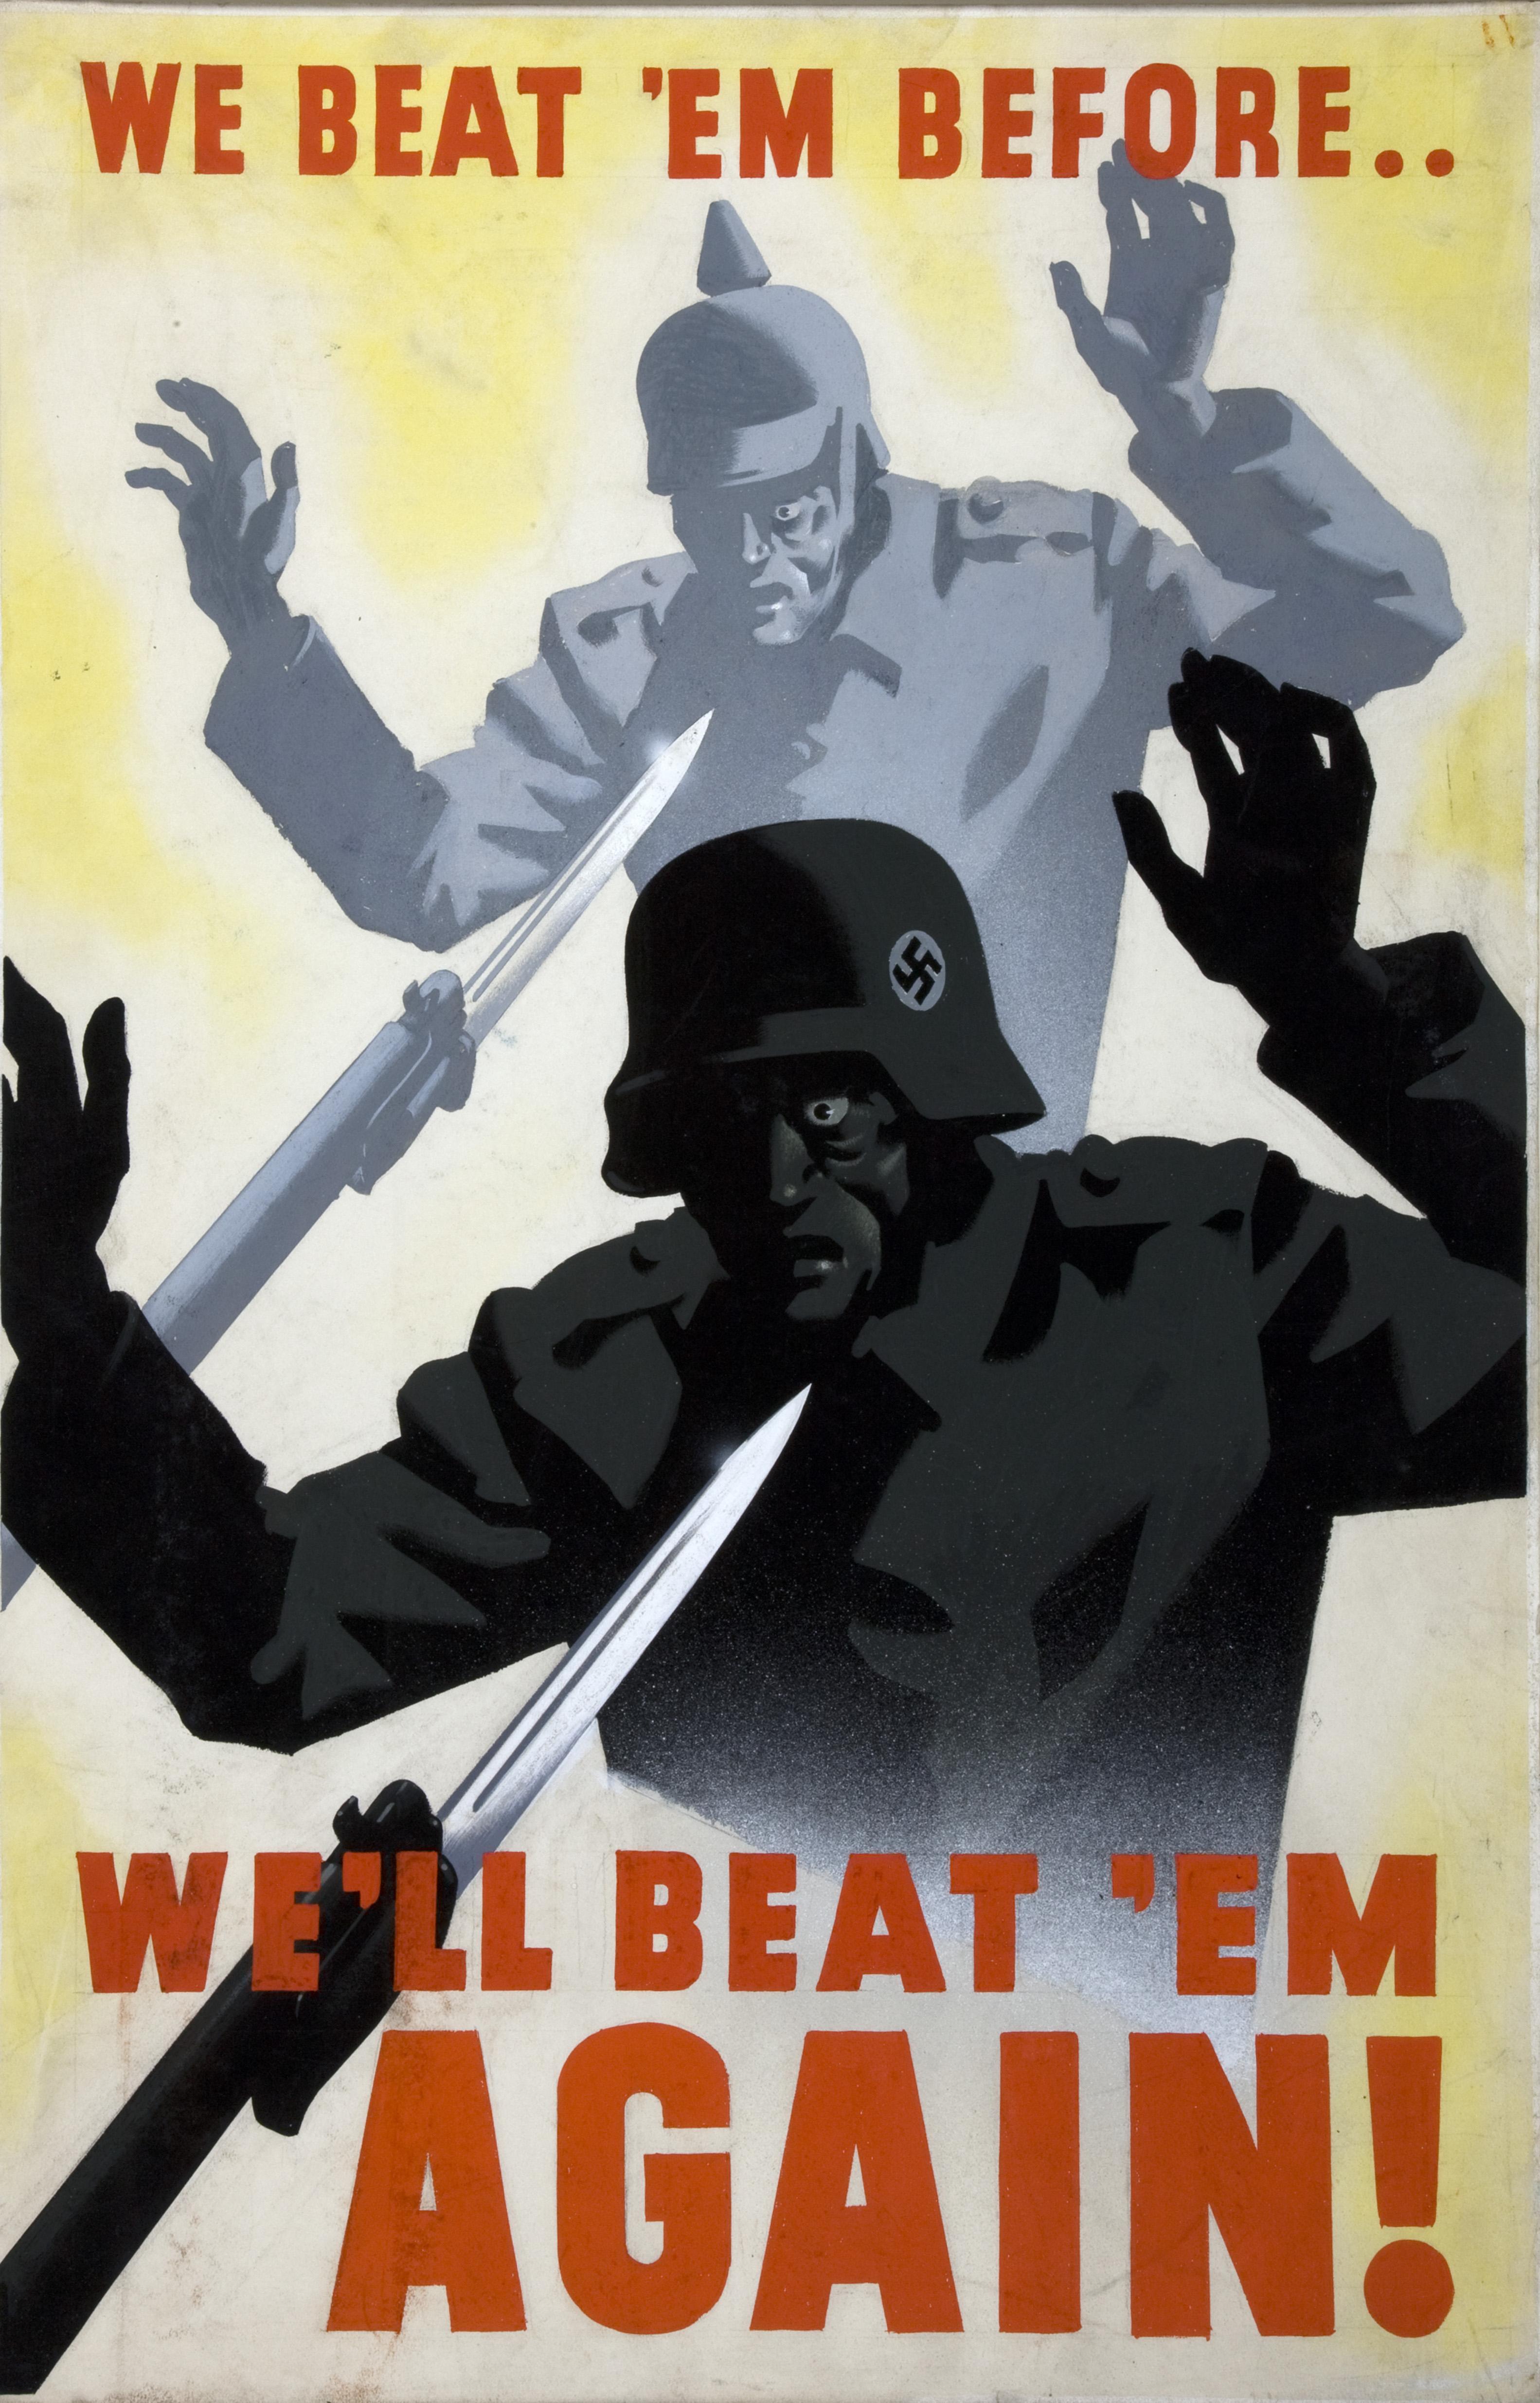 propaganda and war Propaganda for war hc peterson 1939 how propaganda works jason stanley 2015 high-level and very worthwhile mein kampf adolf hitler vol i ch vi, vol ii.